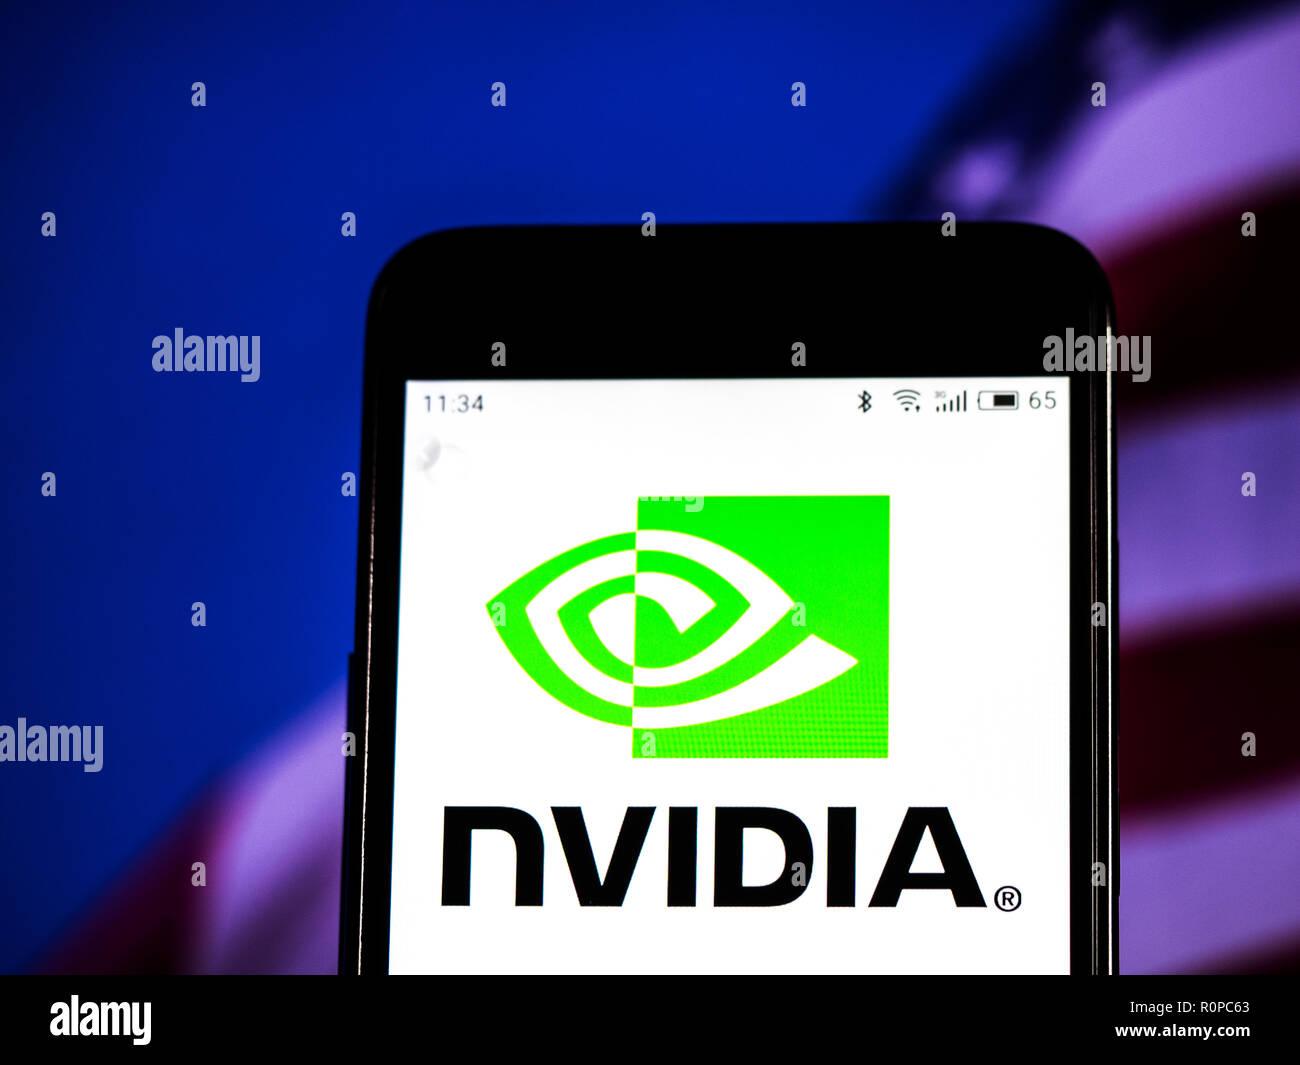 Nvidia Geforce Stock Photos & Nvidia Geforce Stock Images